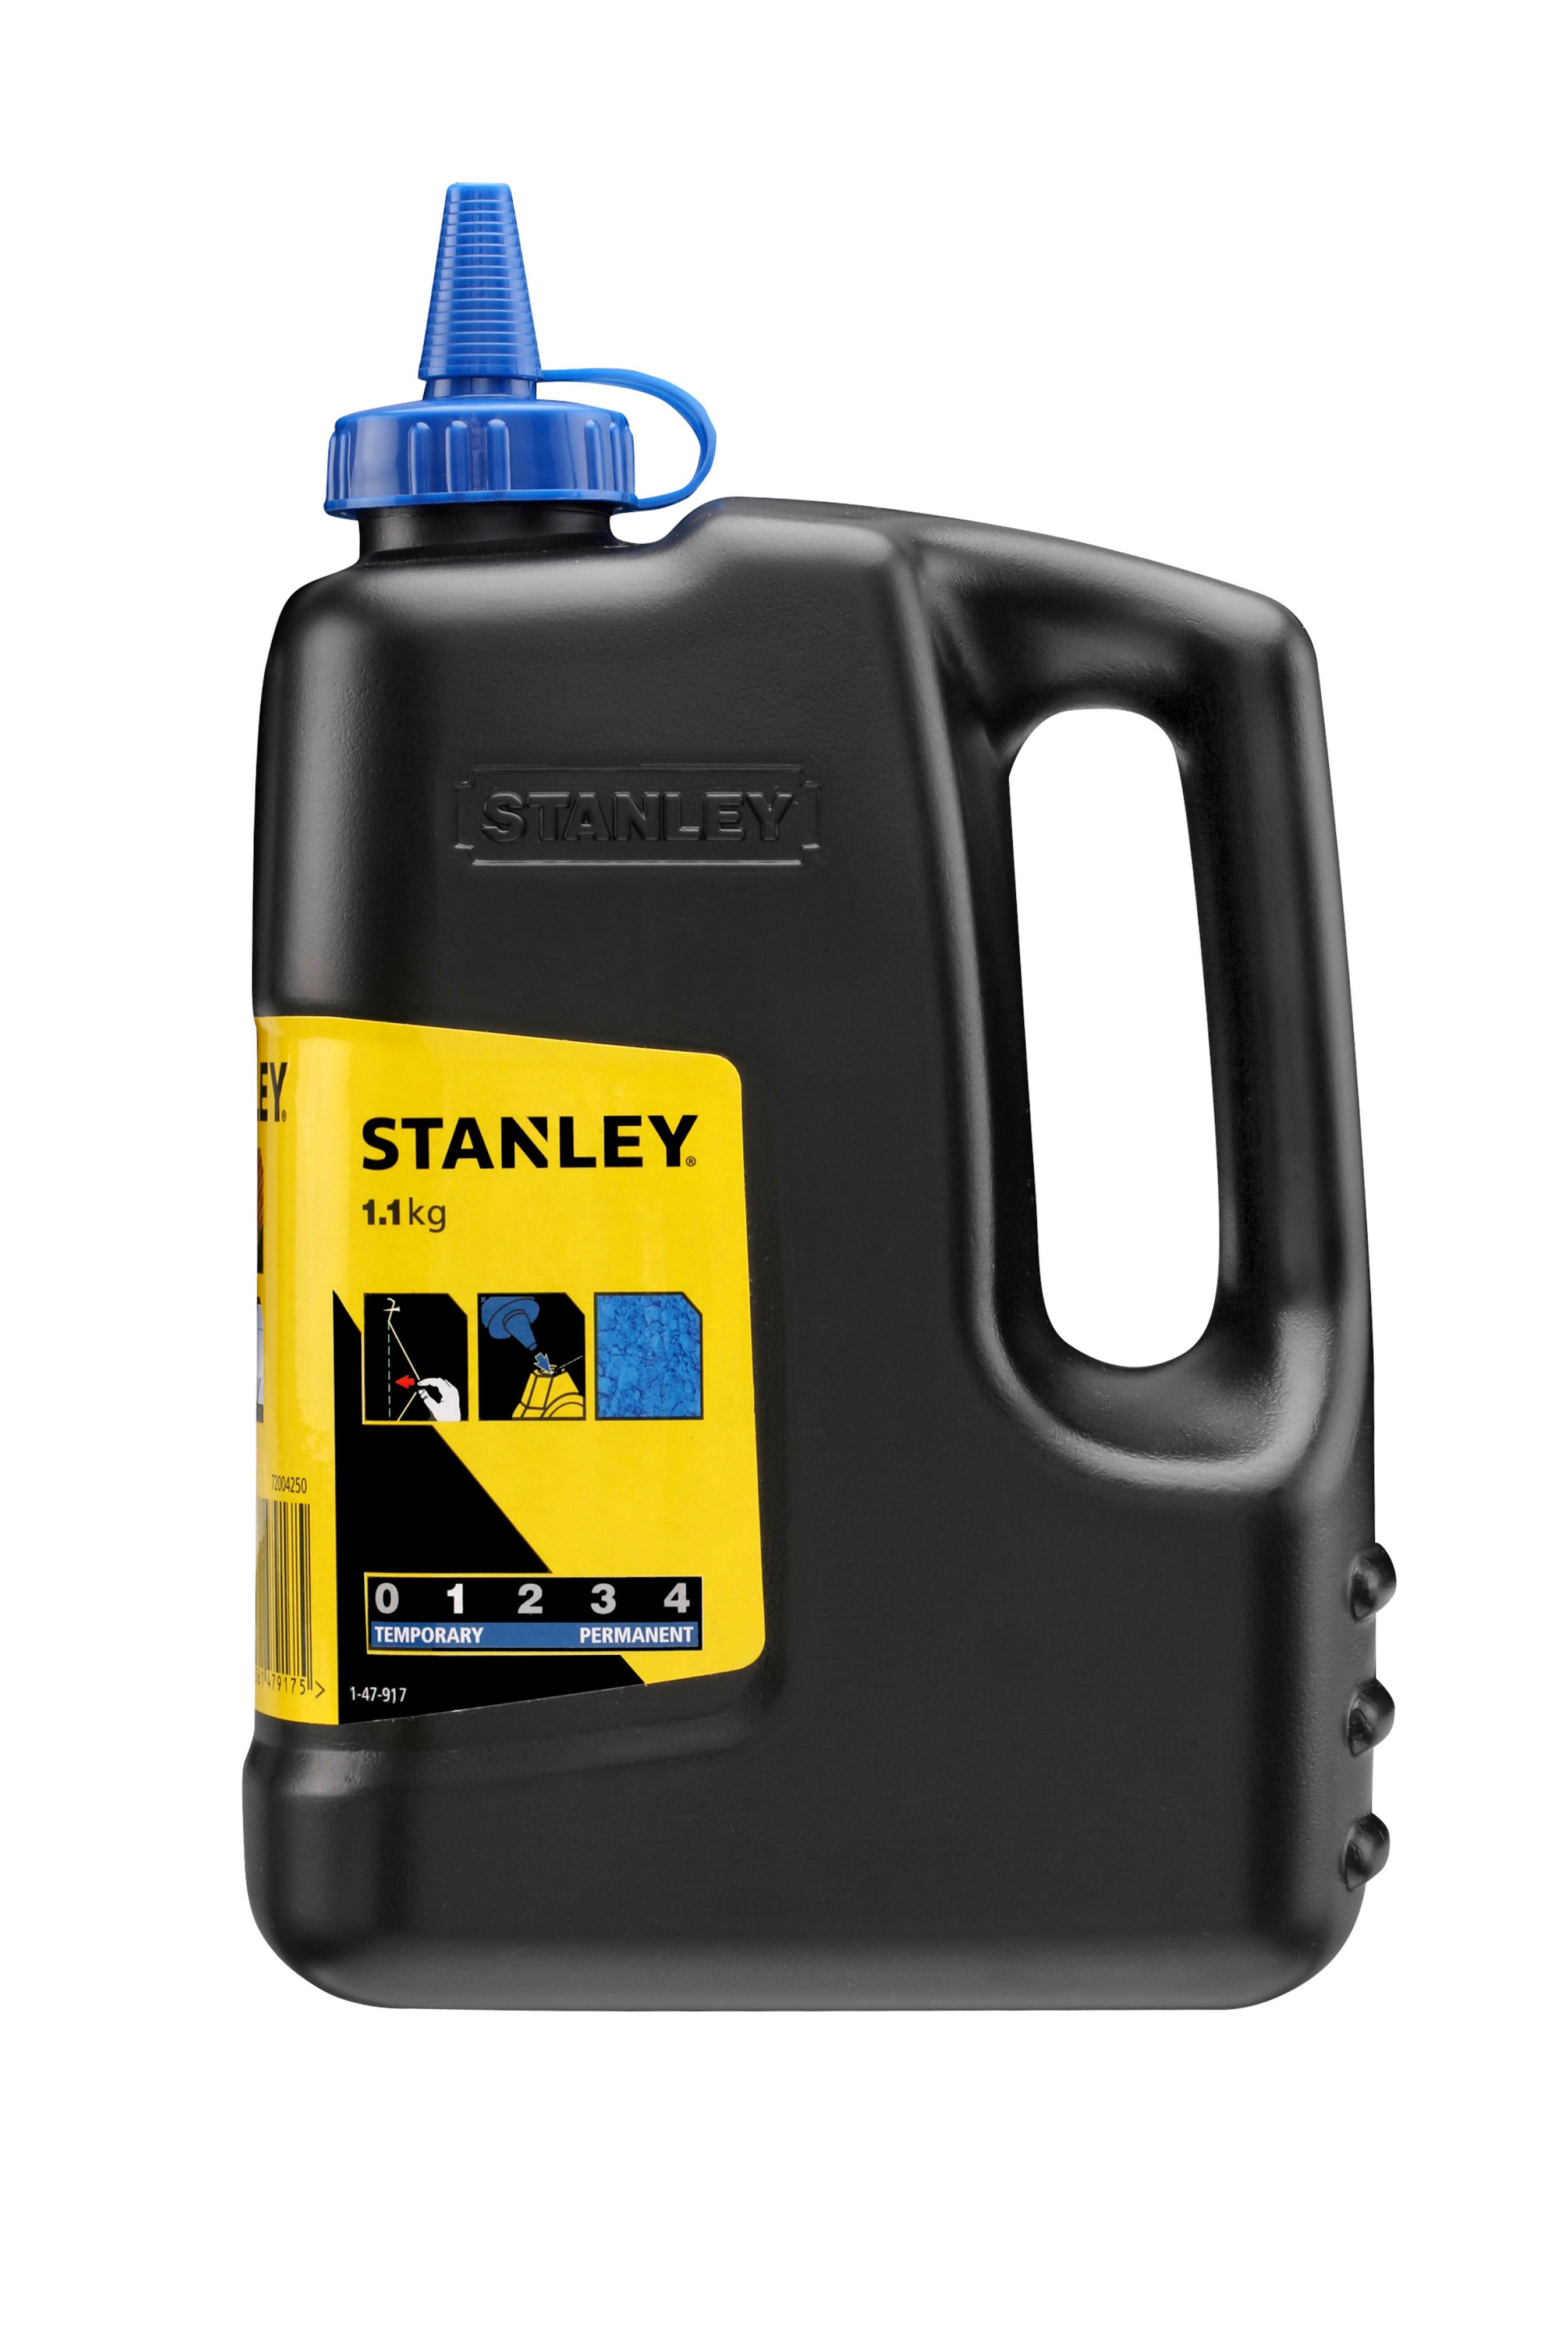 479171 Sinine tahvel 1000g, Stanley